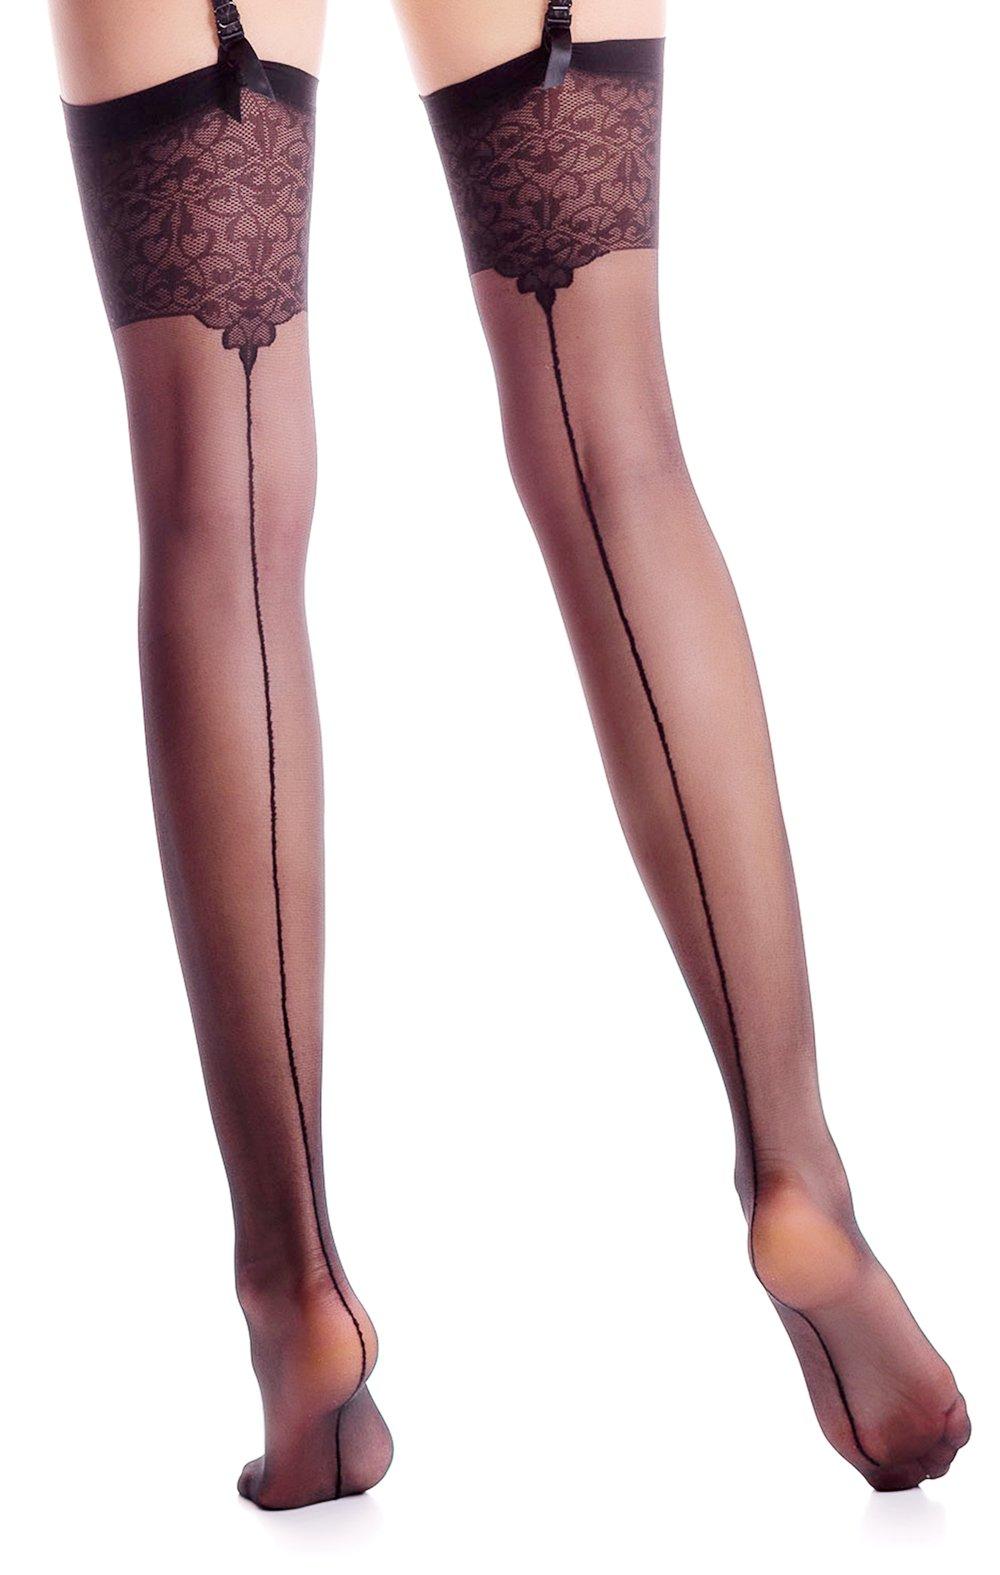 Thigh High Seamed Stockings for Garter Belt Patterned Top Back Seam S M L (M, Black 01)